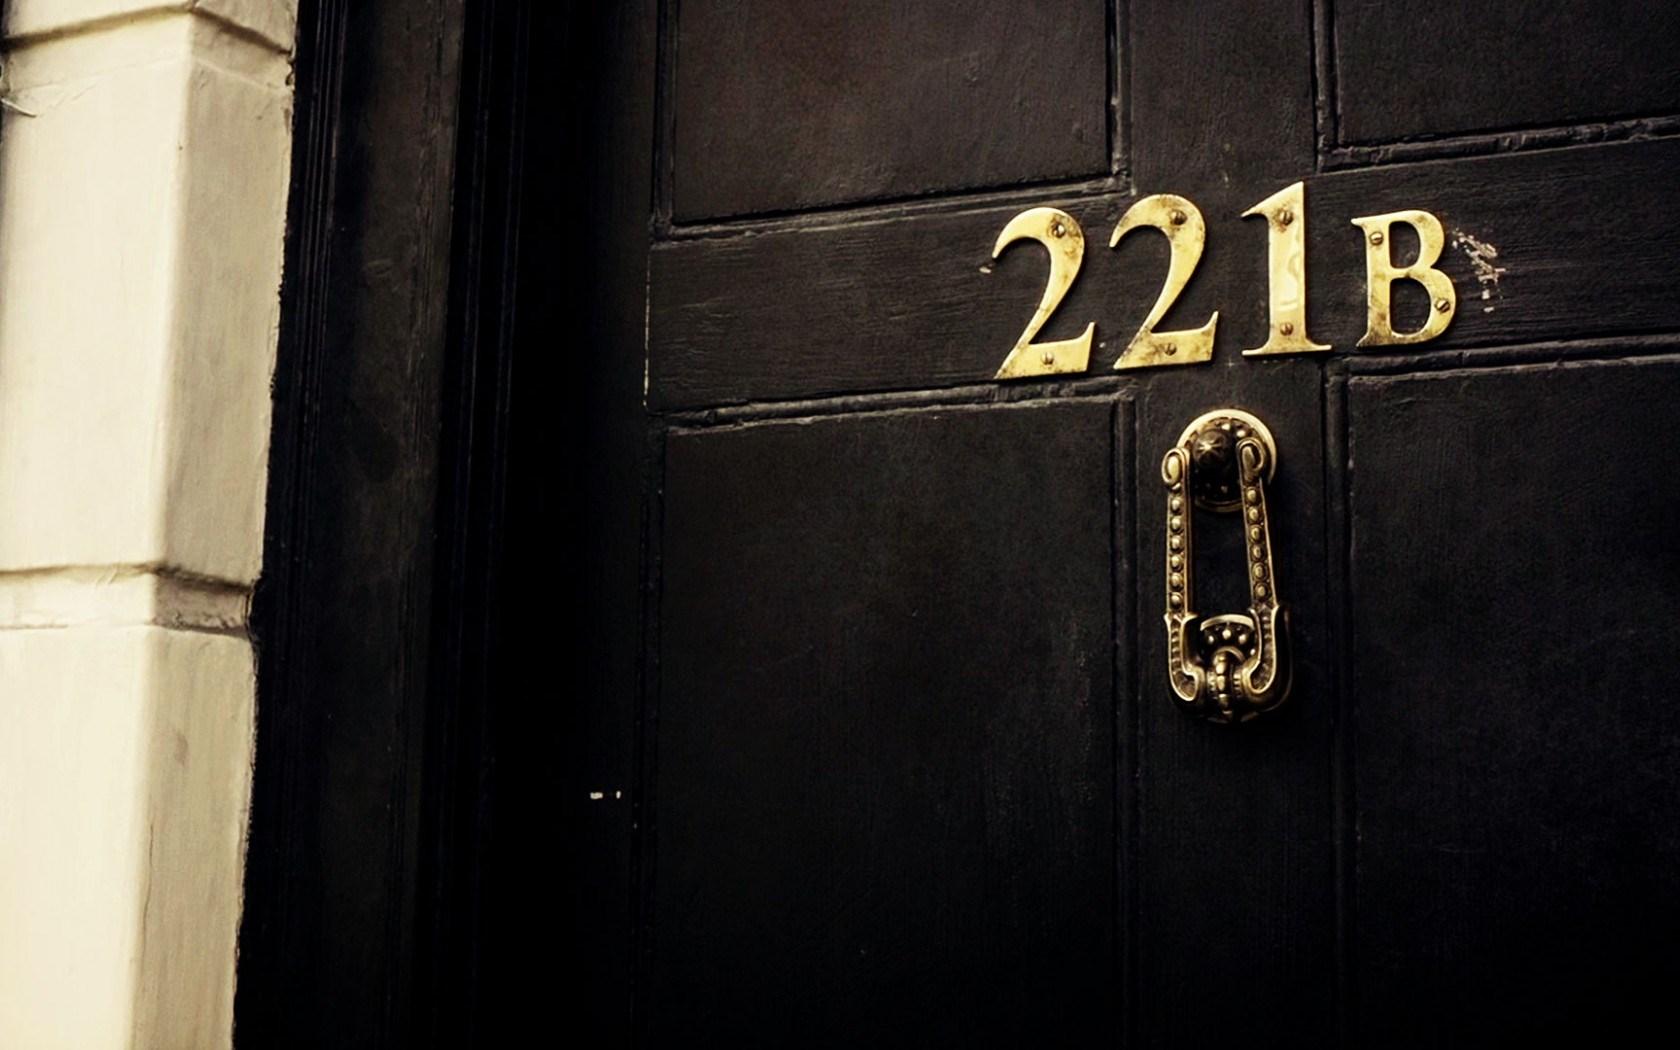 bakerstreet 221b